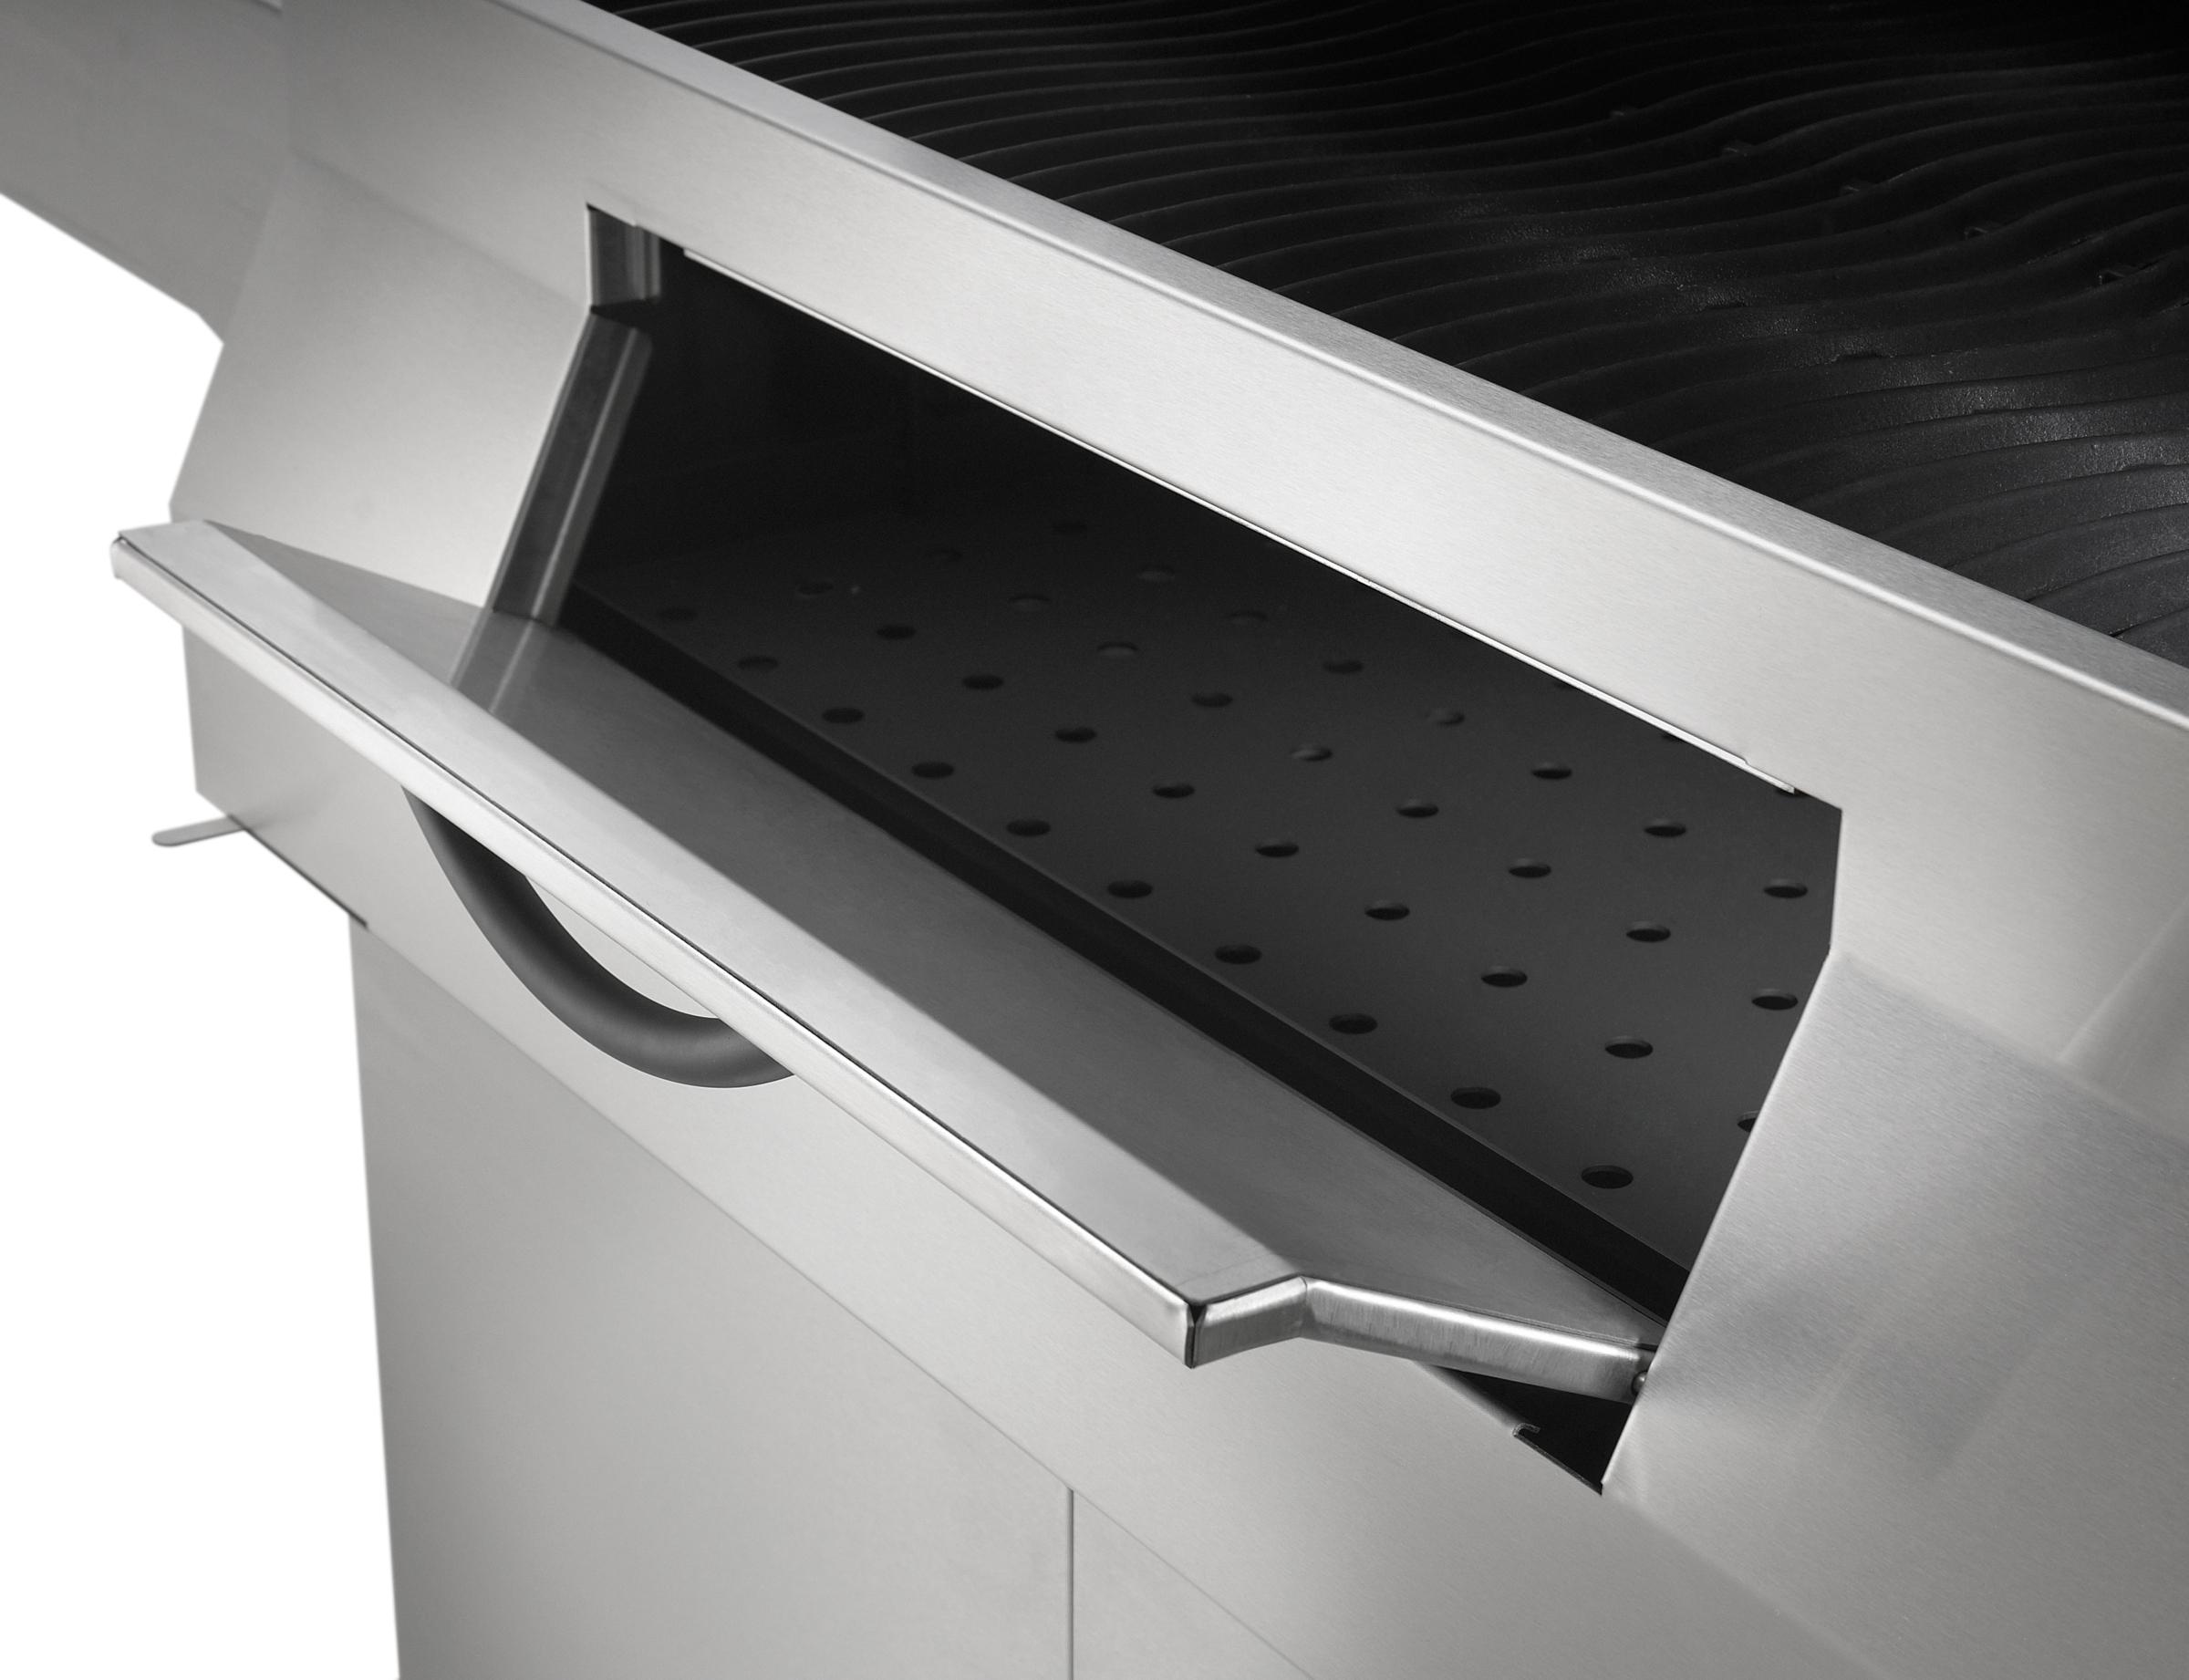 Holzkohlegrill / Grill Napoleon Charcoal Professional PRO605 Edelstahl Bild 6